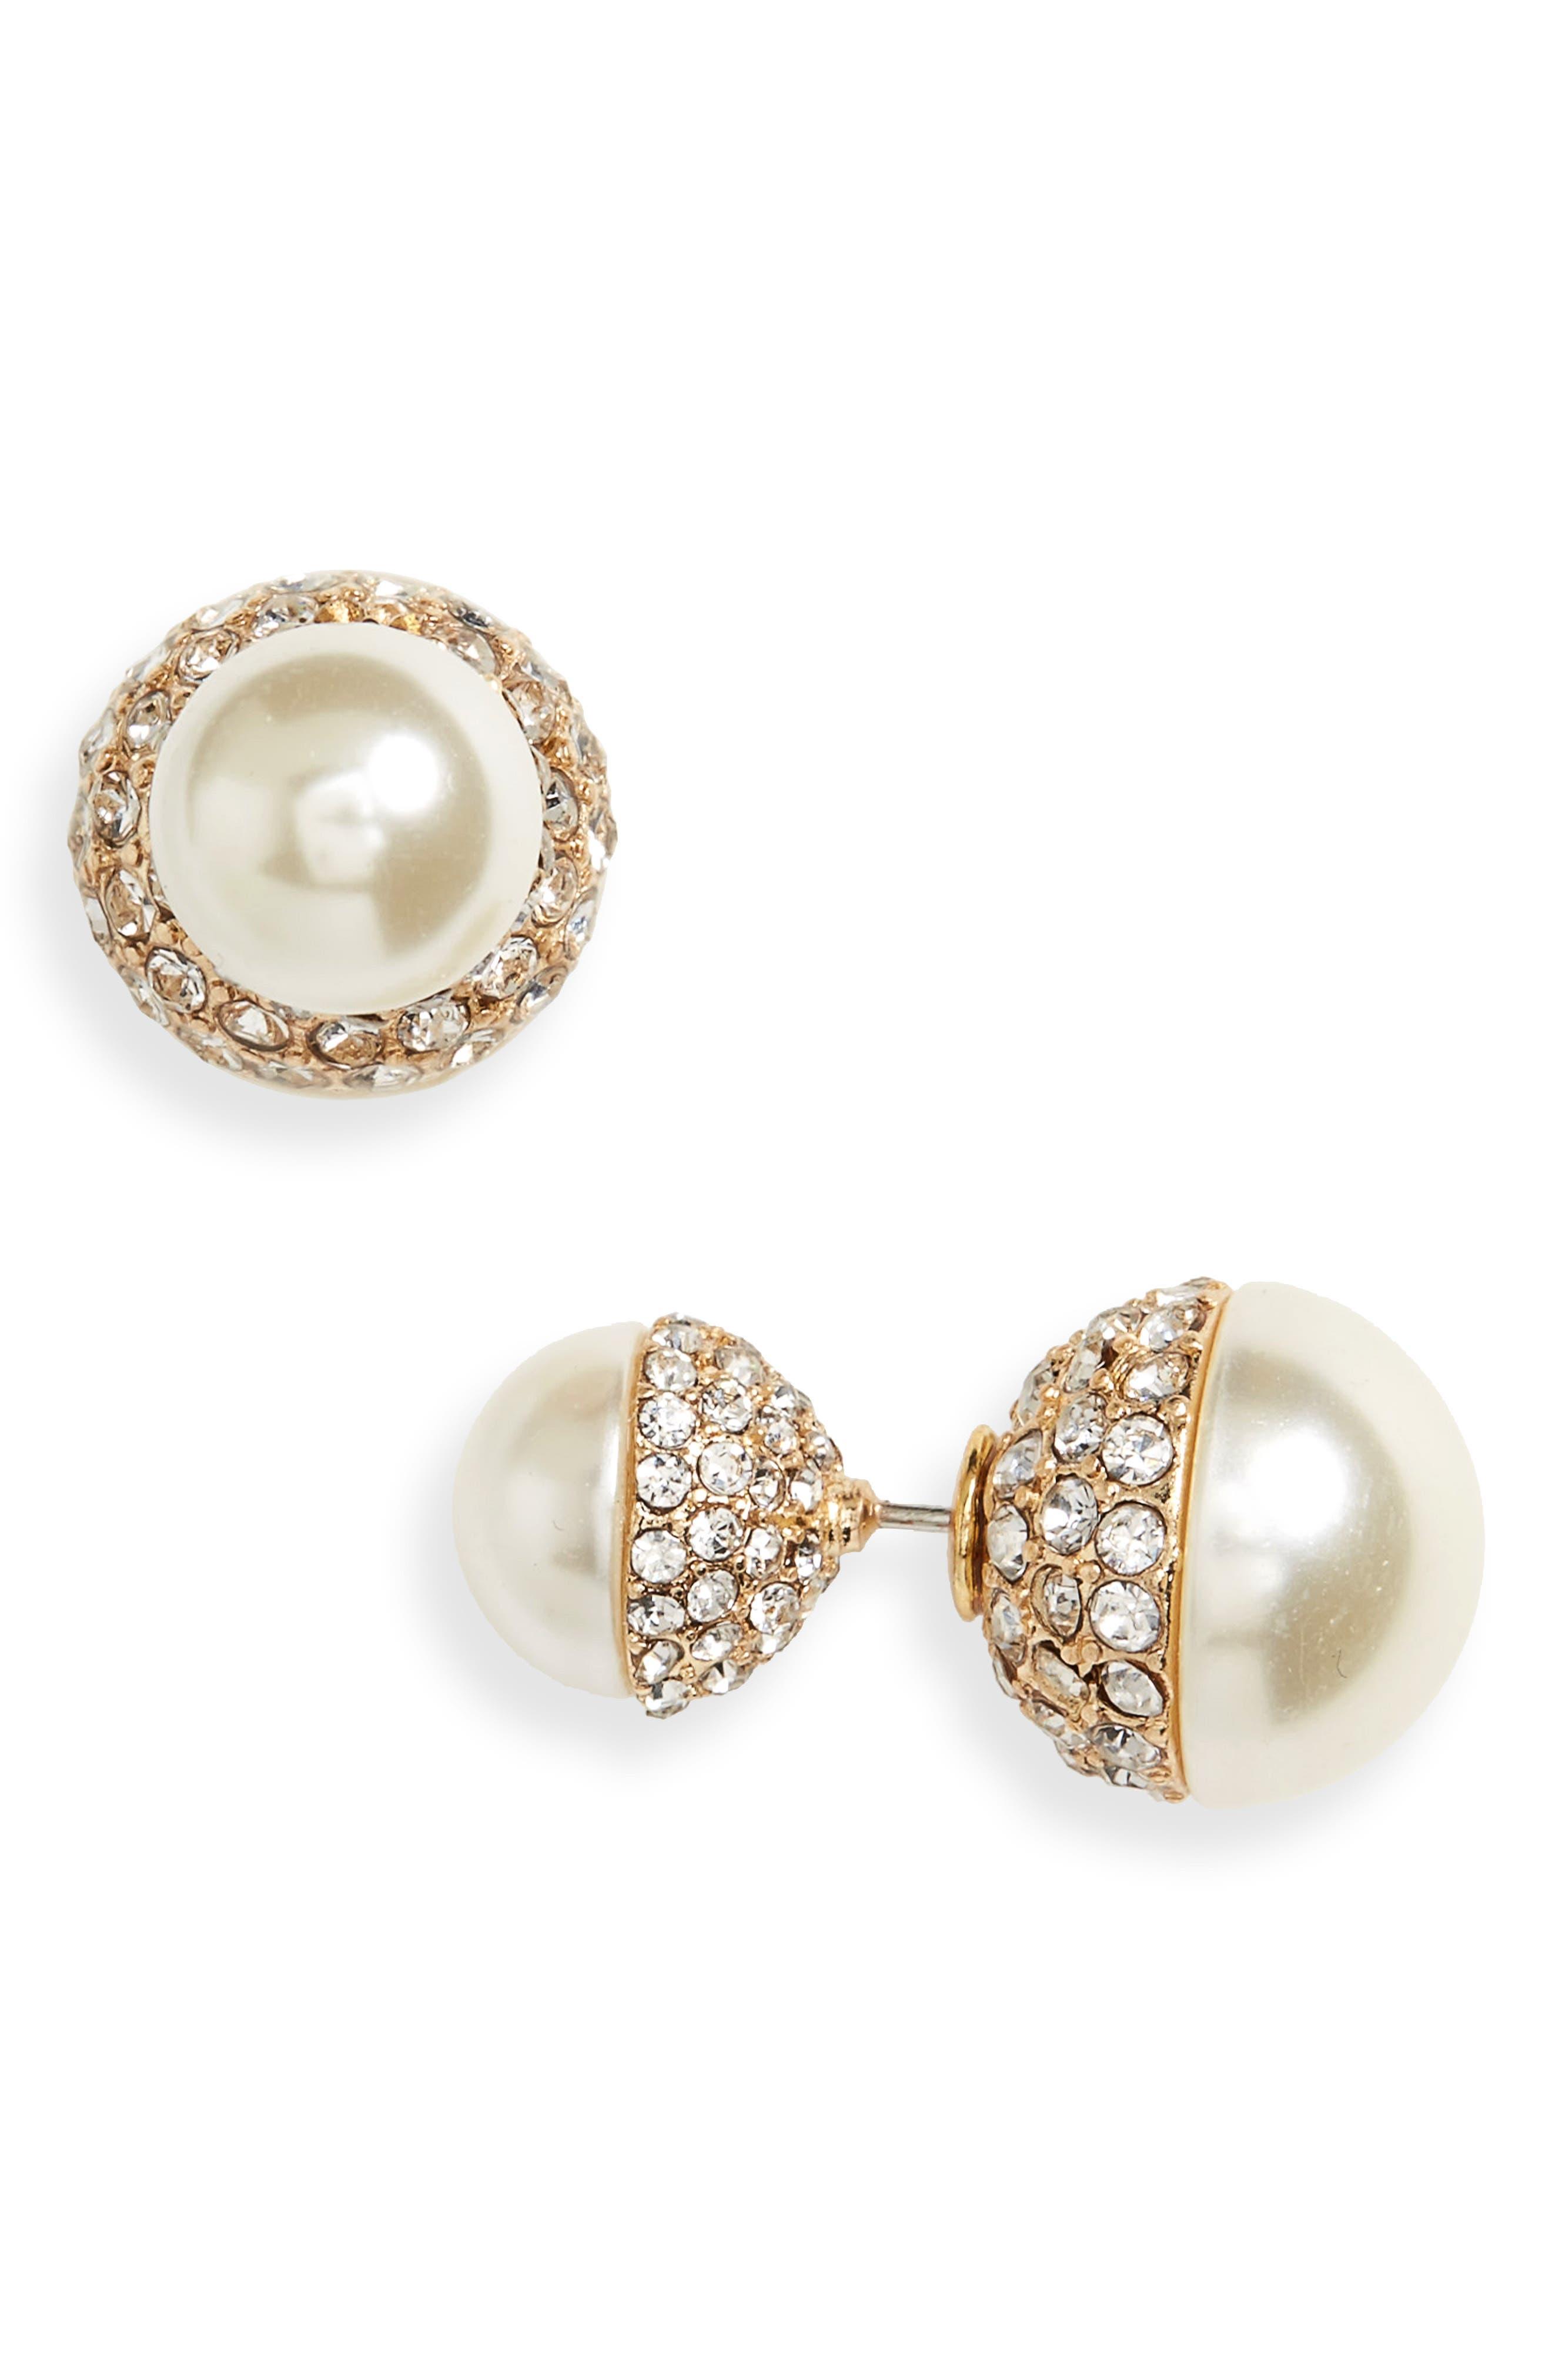 Main Image - Cara Imitation Pearl & Crystal Front/Back Earrings